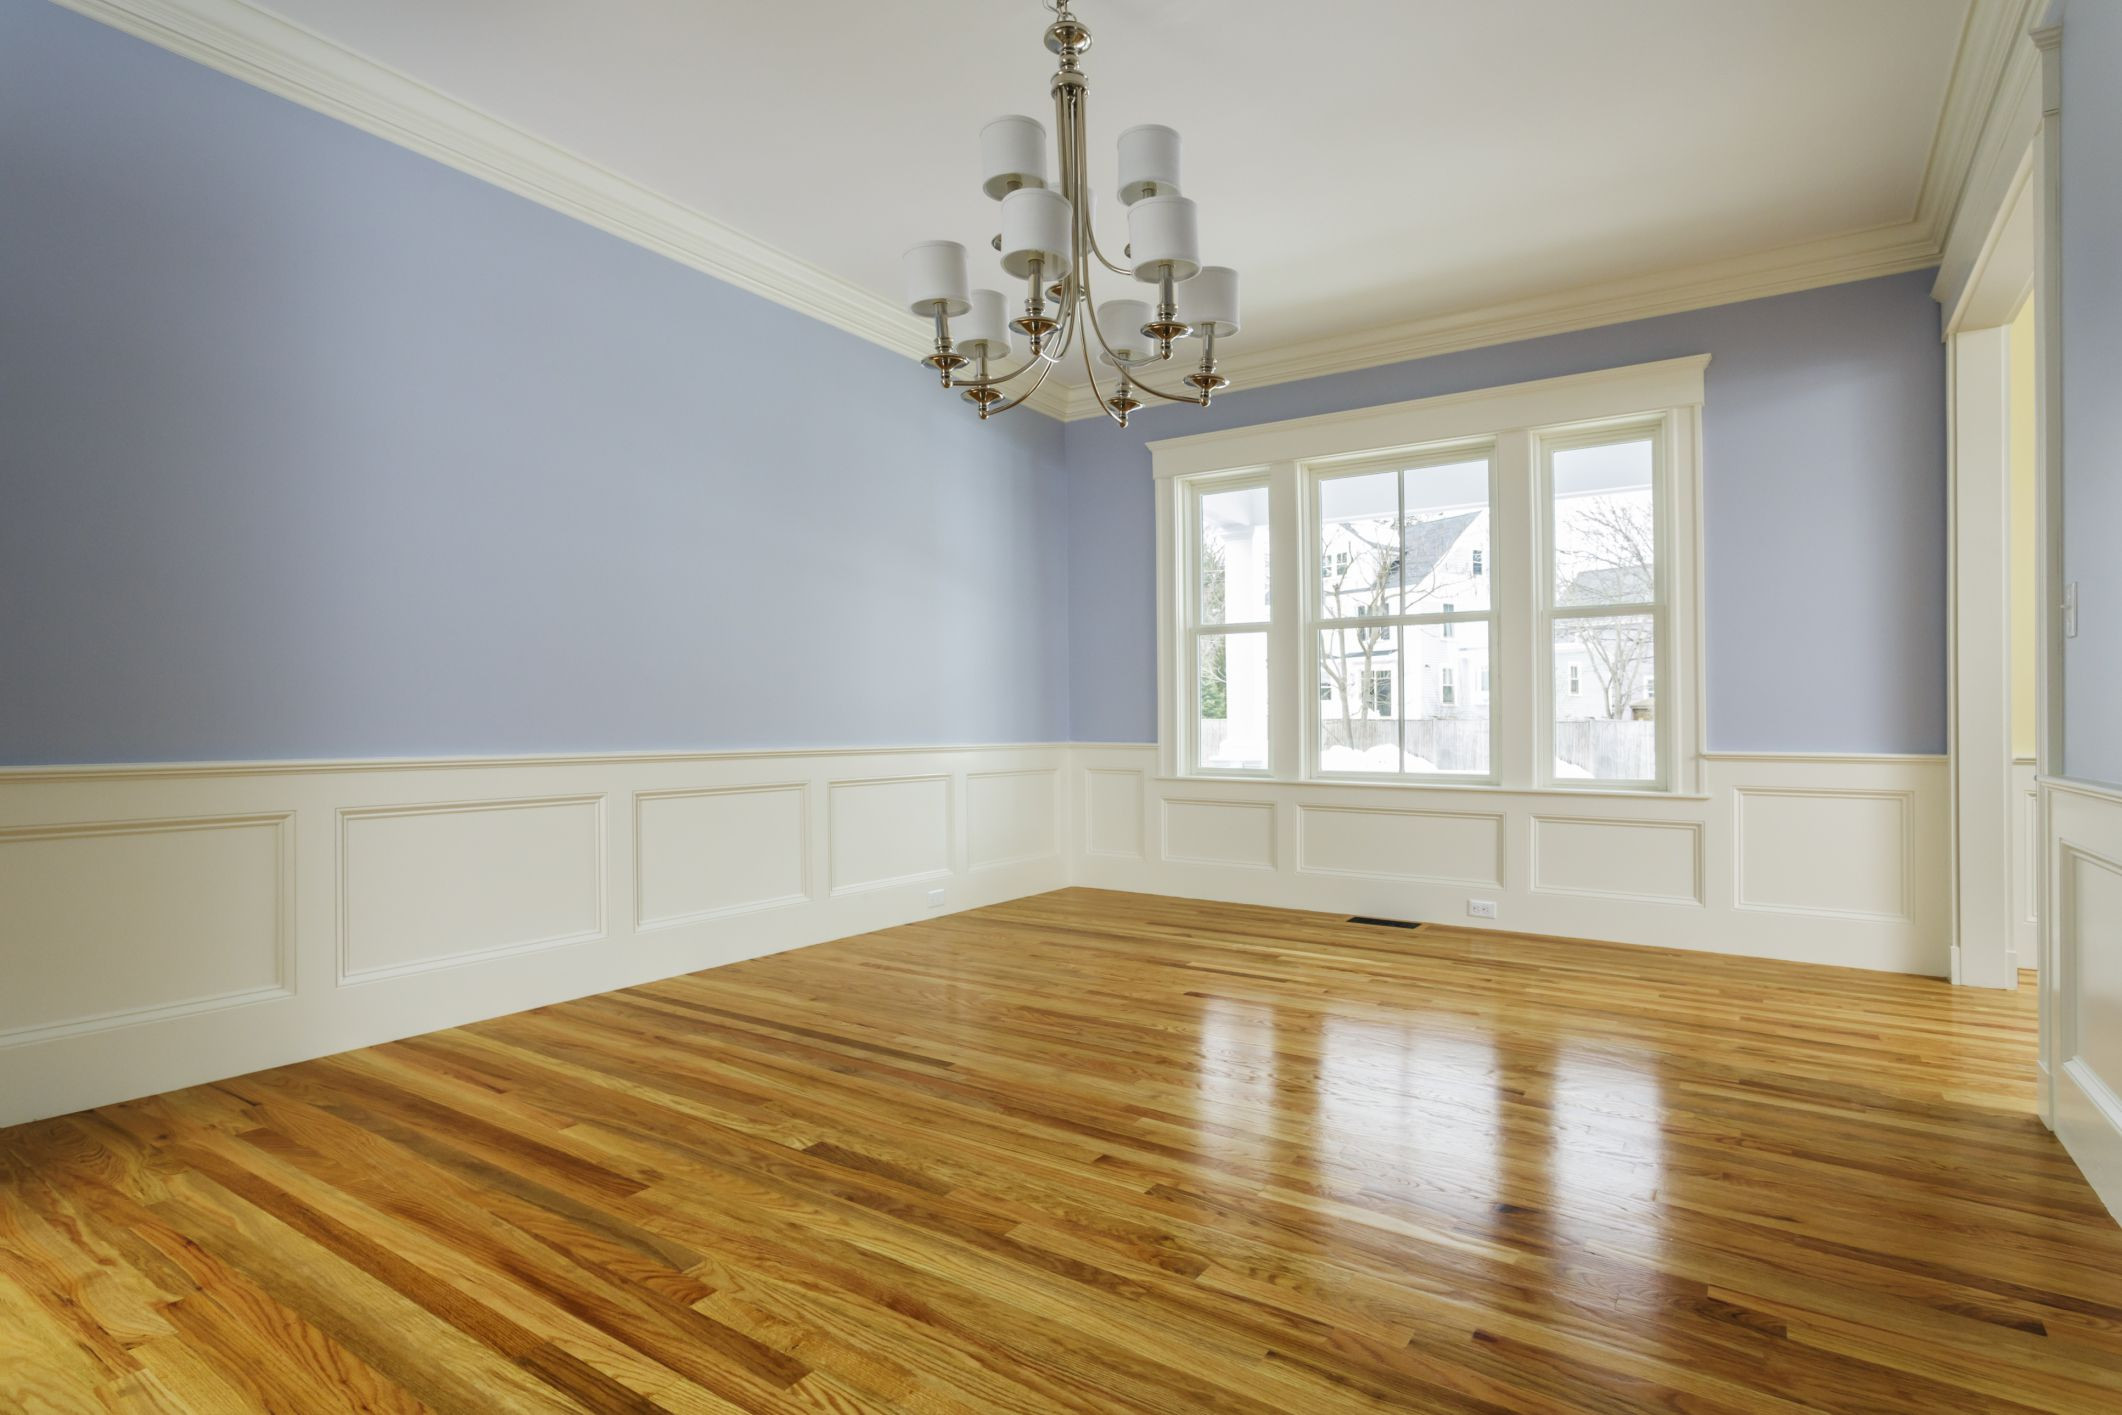 14 Lovely Hardwood Floor Installation New York City 2021 free download hardwood floor installation new york city of the cost to refinish hardwood floors for 168686572 highres 56a2fd773df78cf7727b6cb3